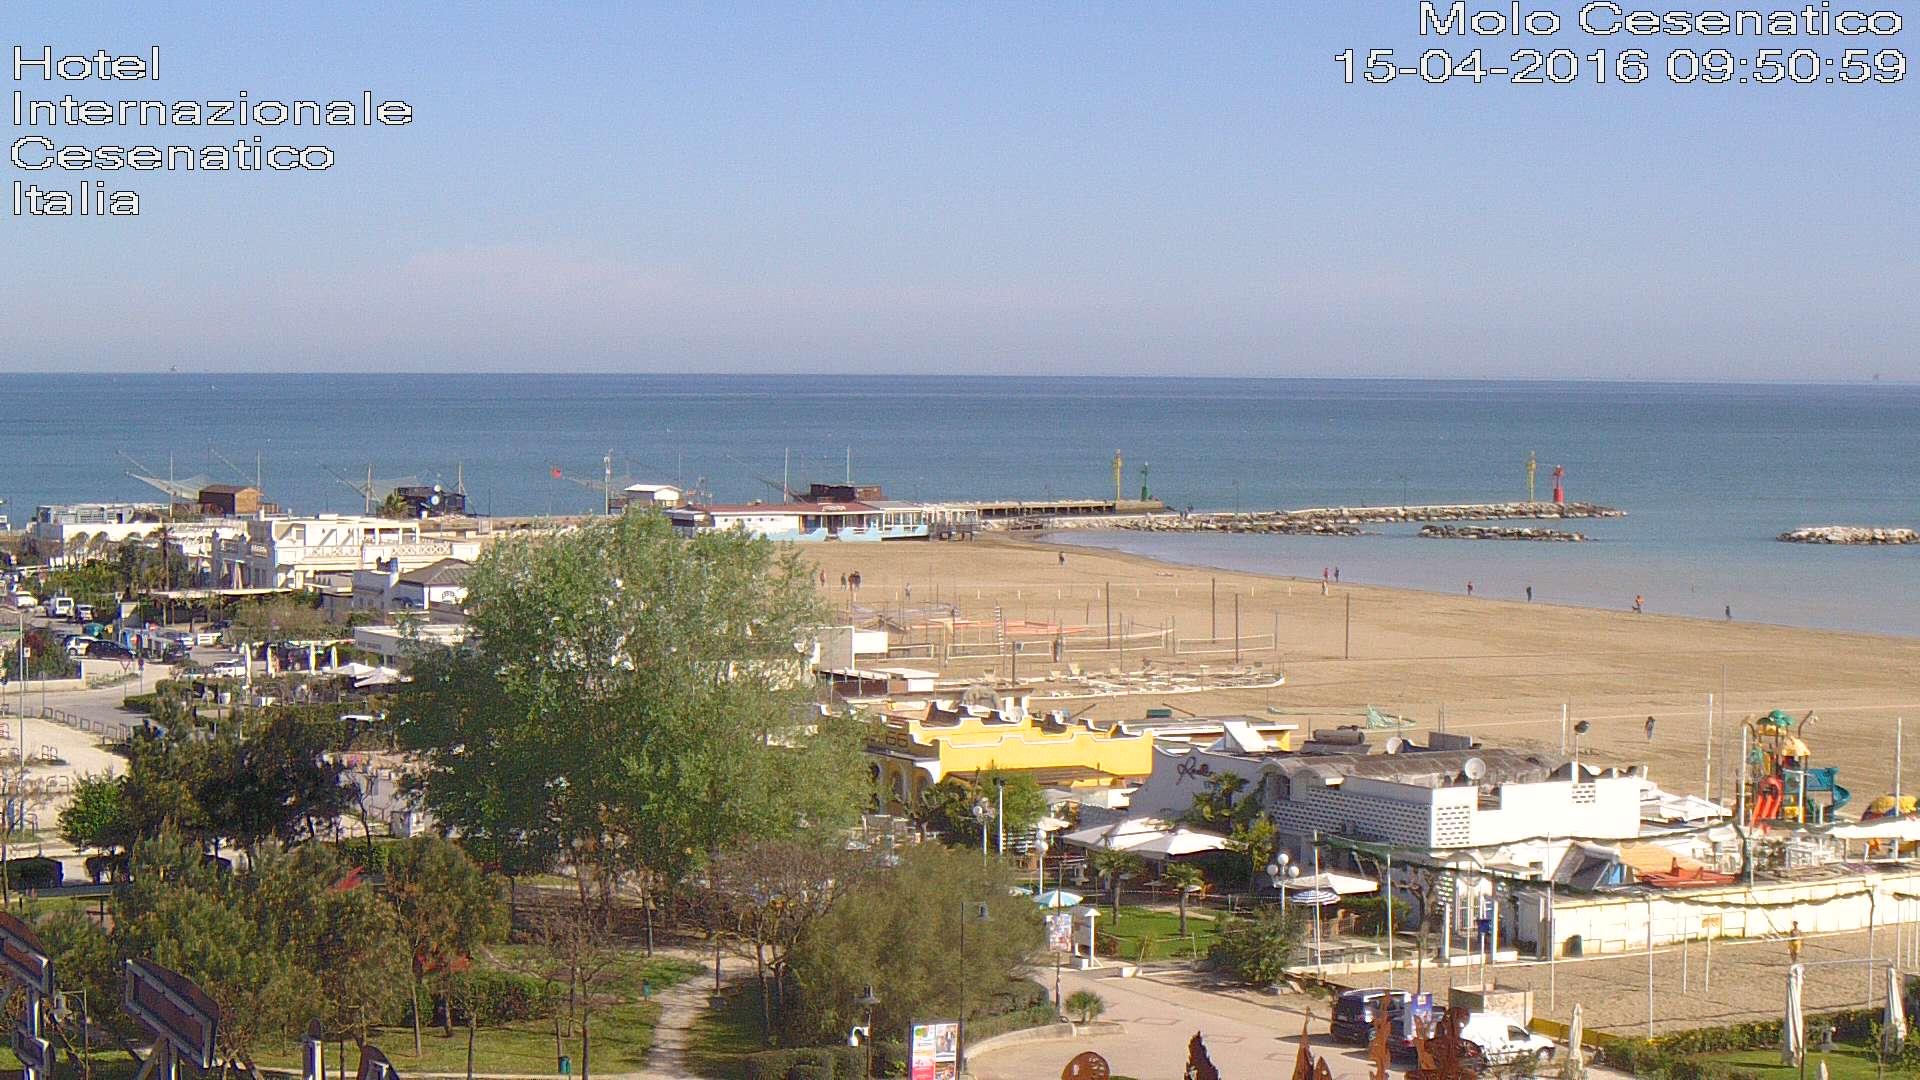 Webcam cesenatico private beach hotel internazionale - Bagno internazionale cesenatico ...